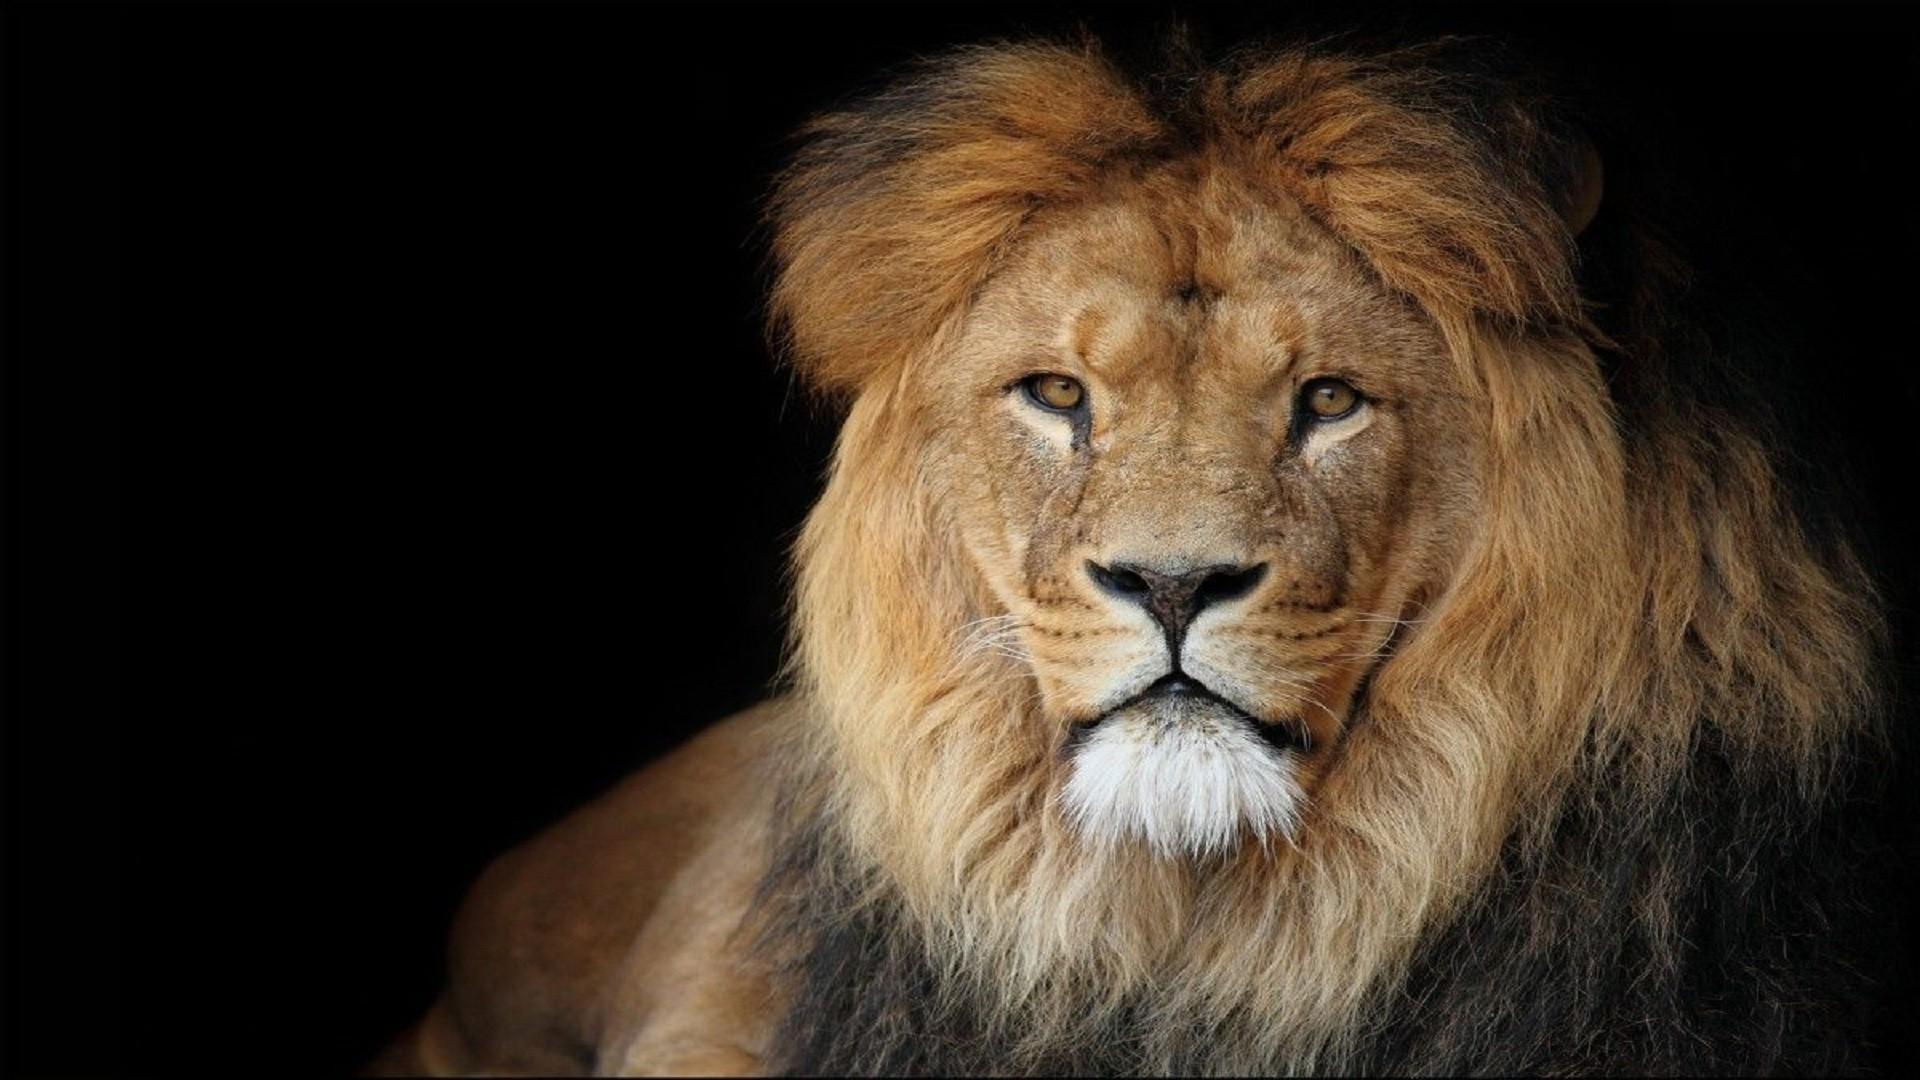 Lion Wallpaper Desktop (68+ Images